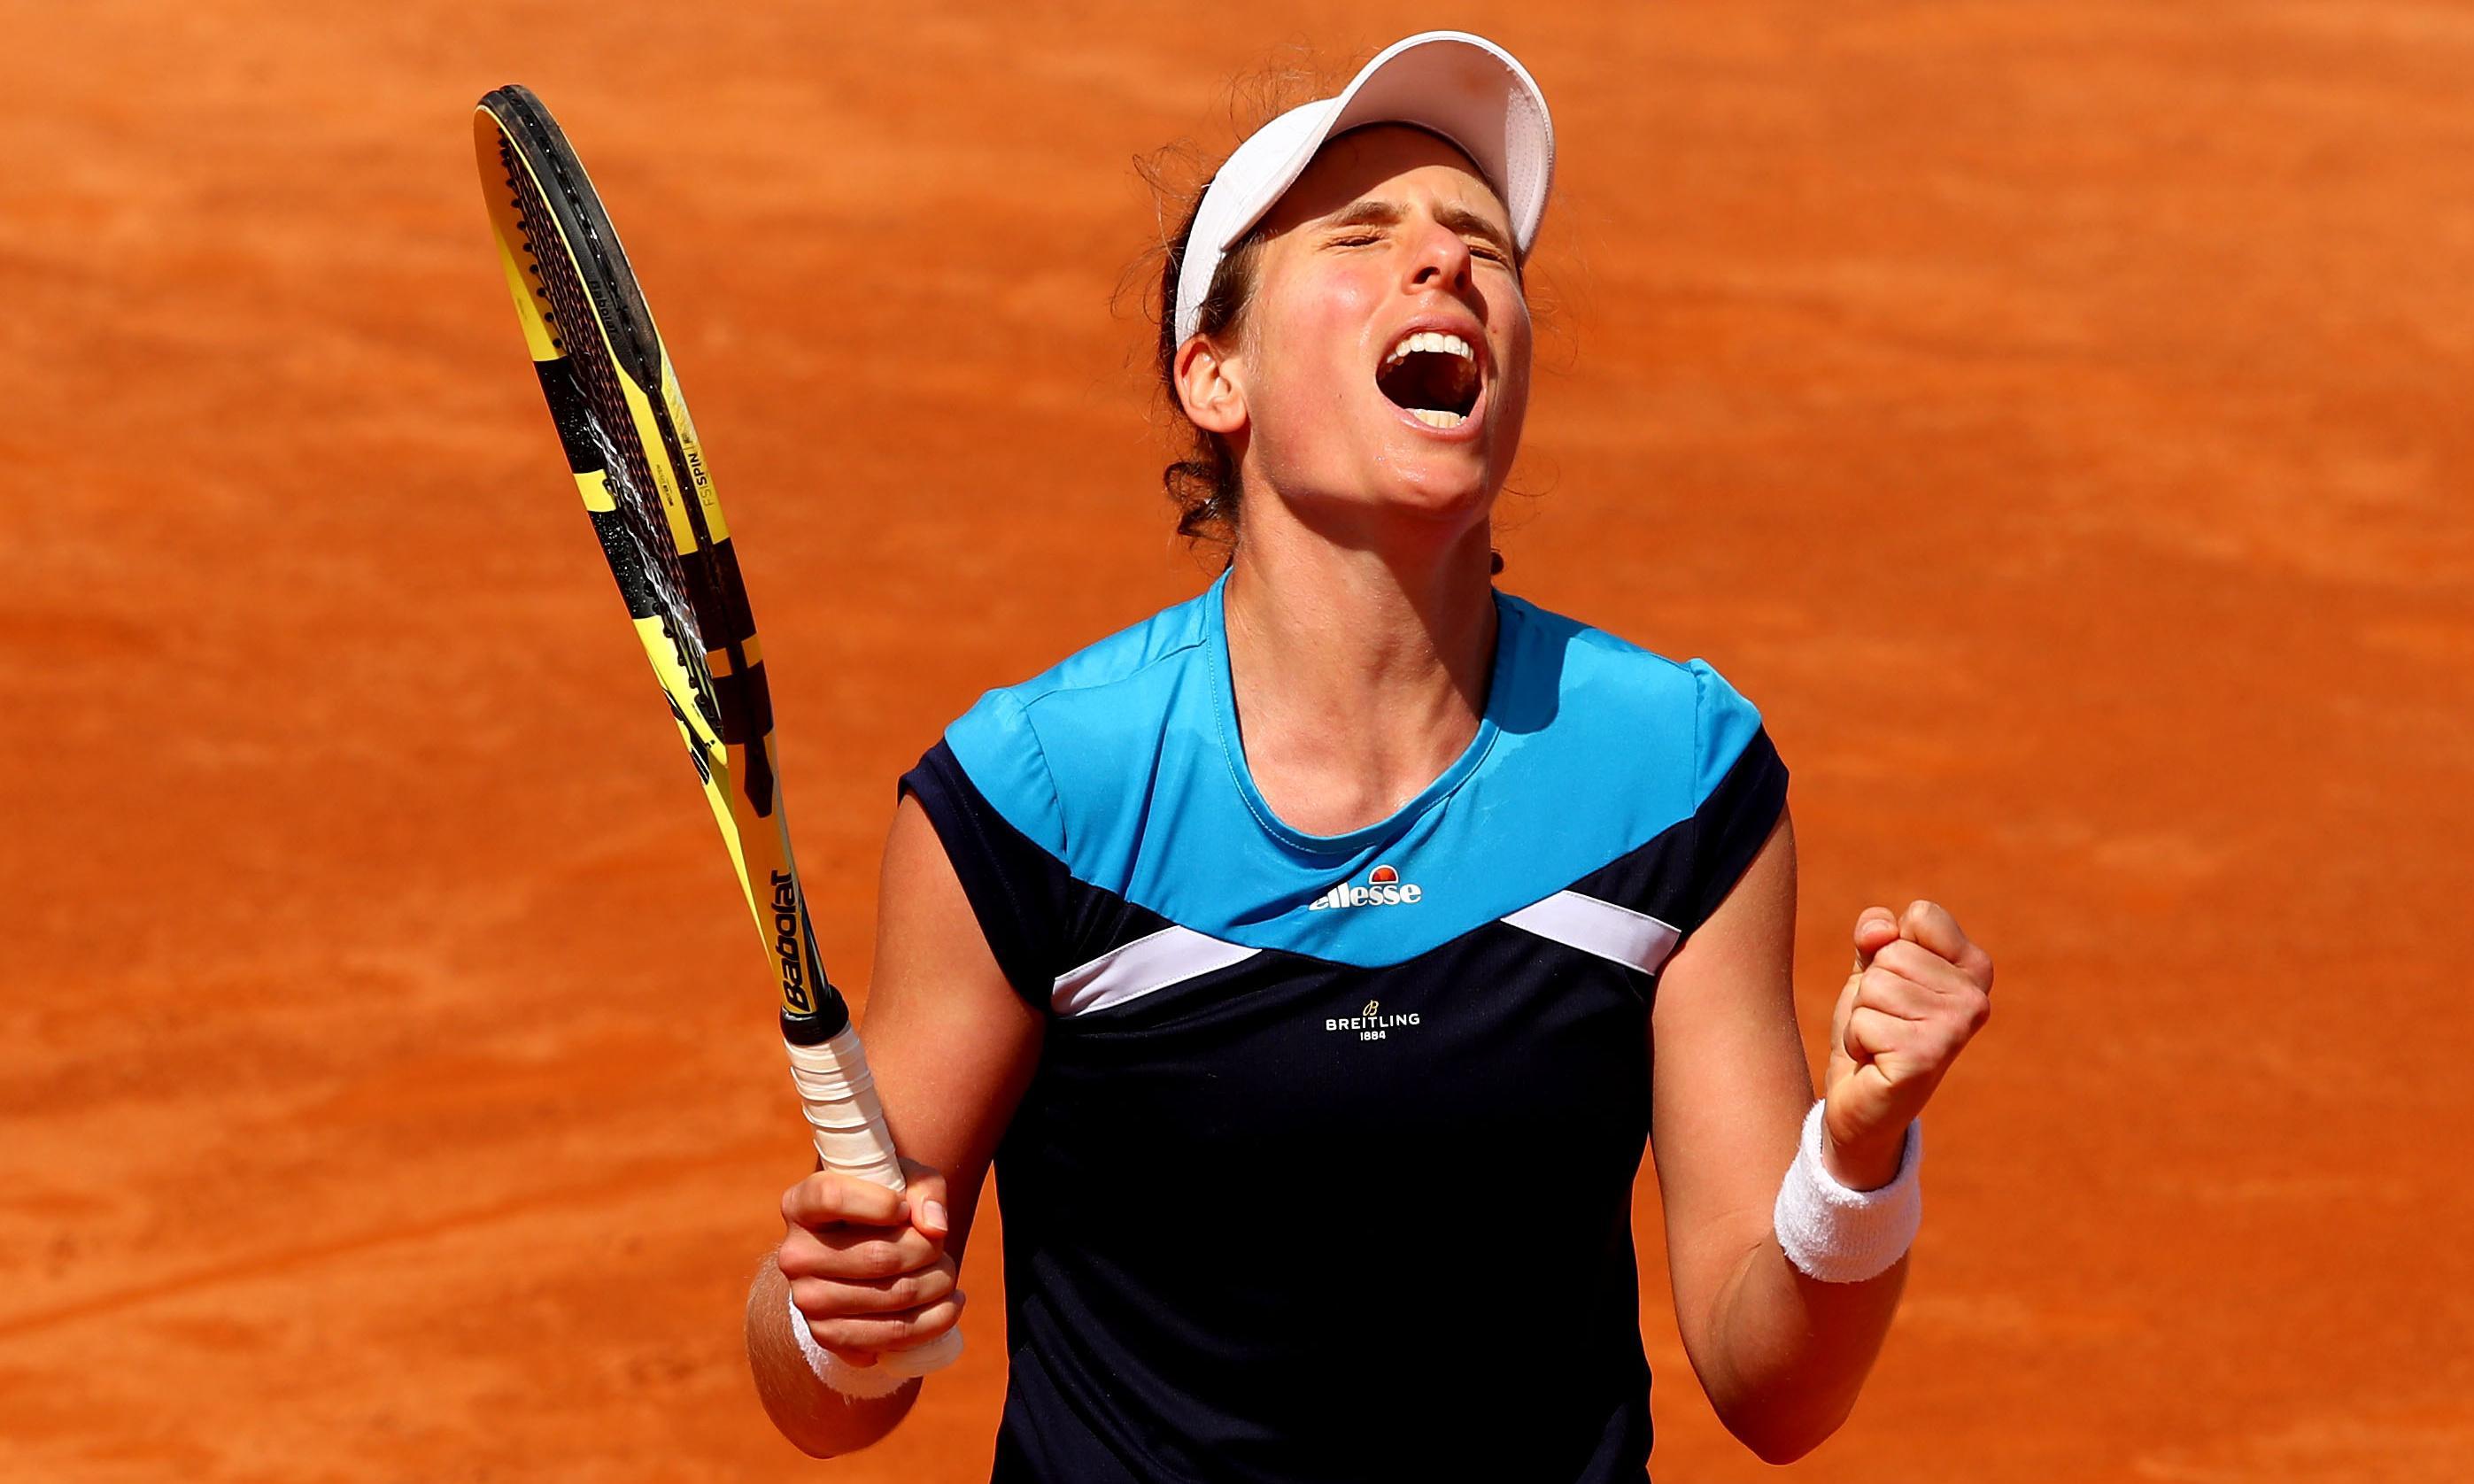 Johanna Konta reaches Italian Open final after victory over Kiki Bertens